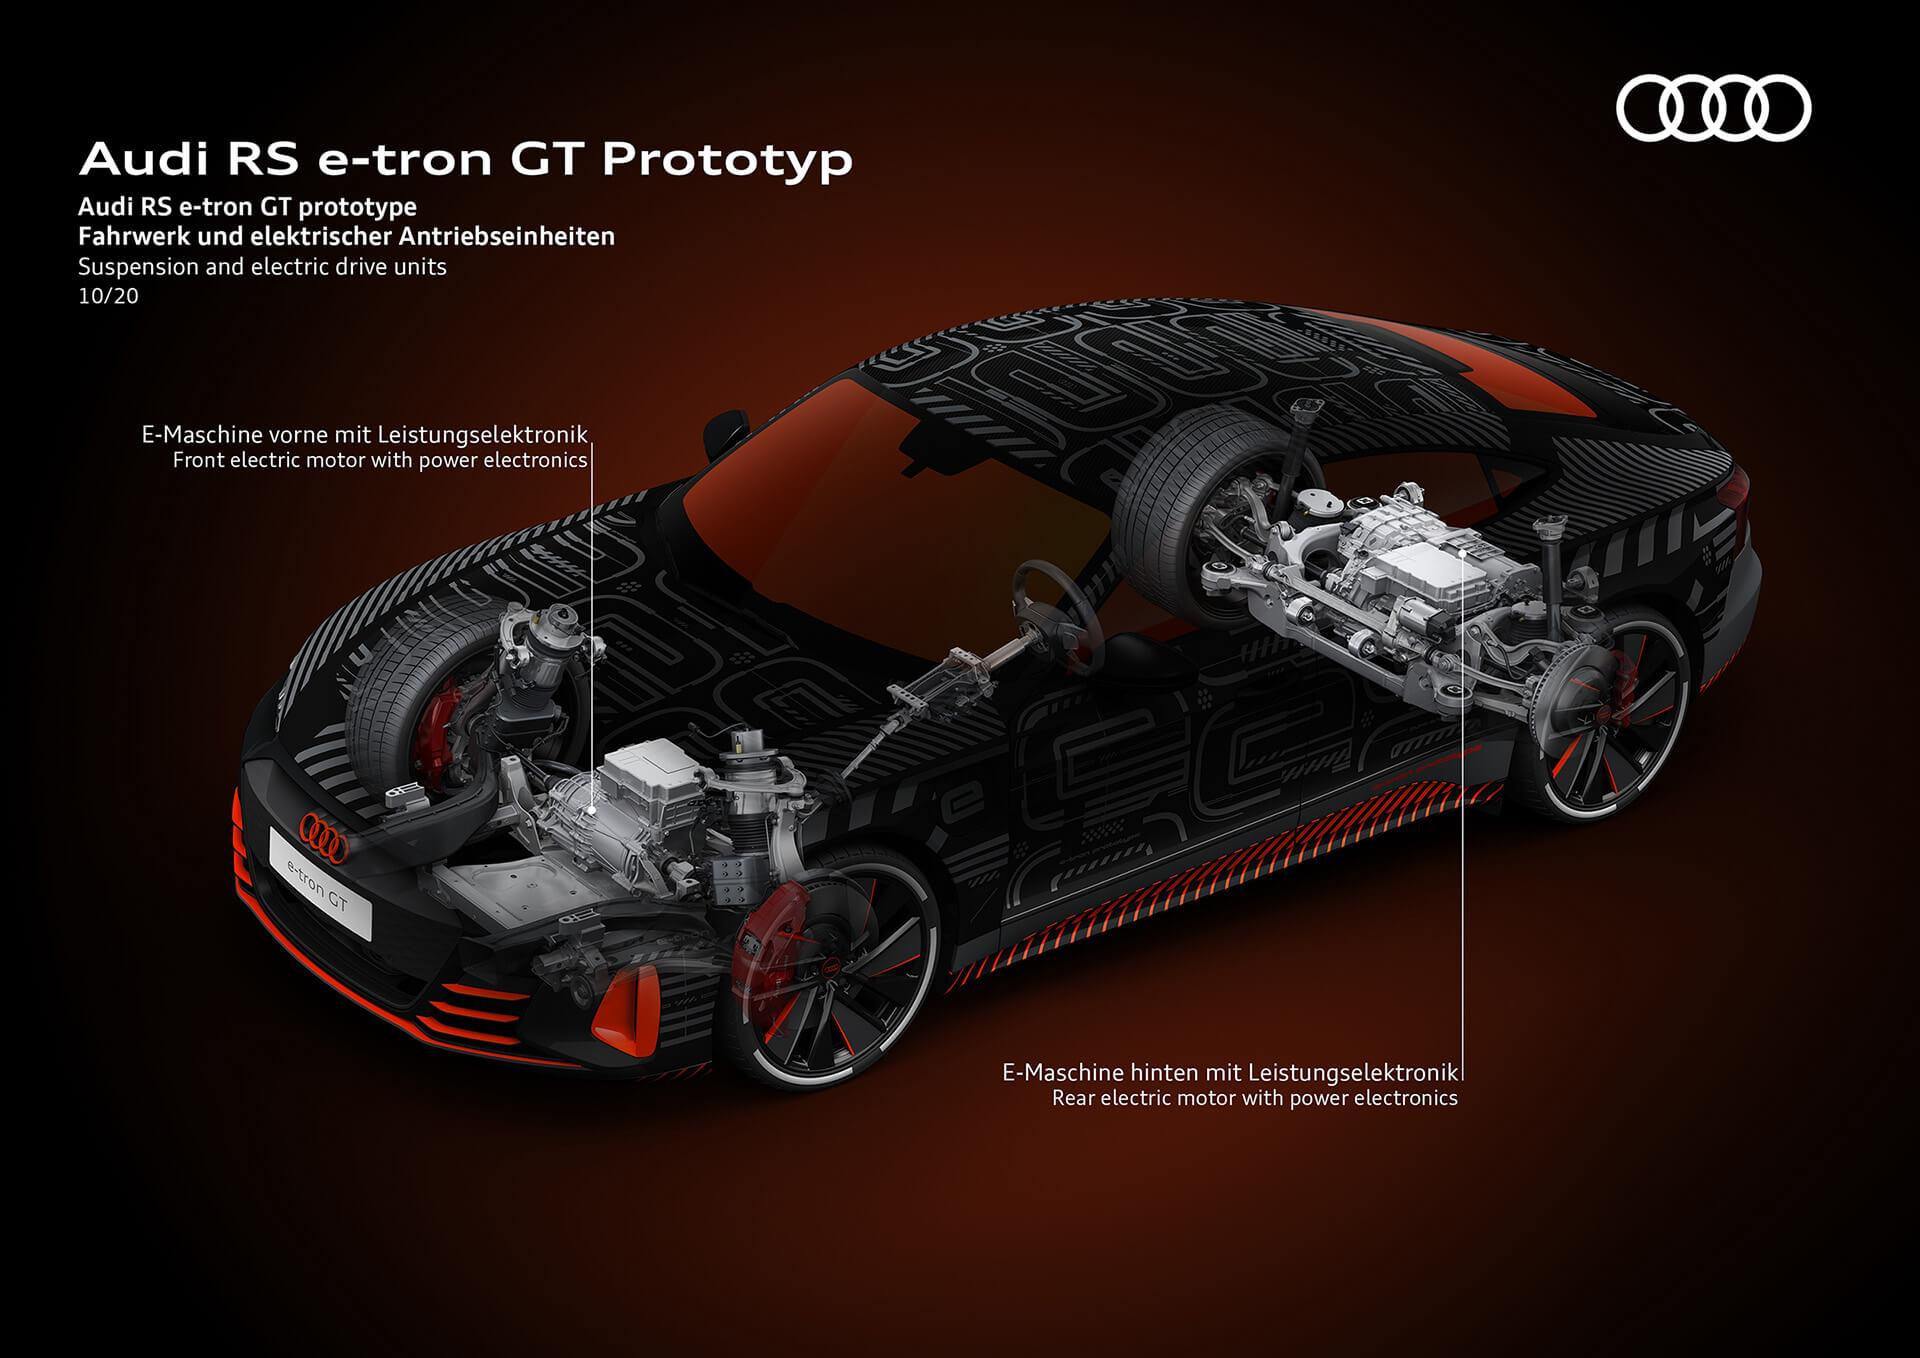 AUDI RS e-tron GT - Ανάρτηση και μονάδες ηλεκτροκίνησης